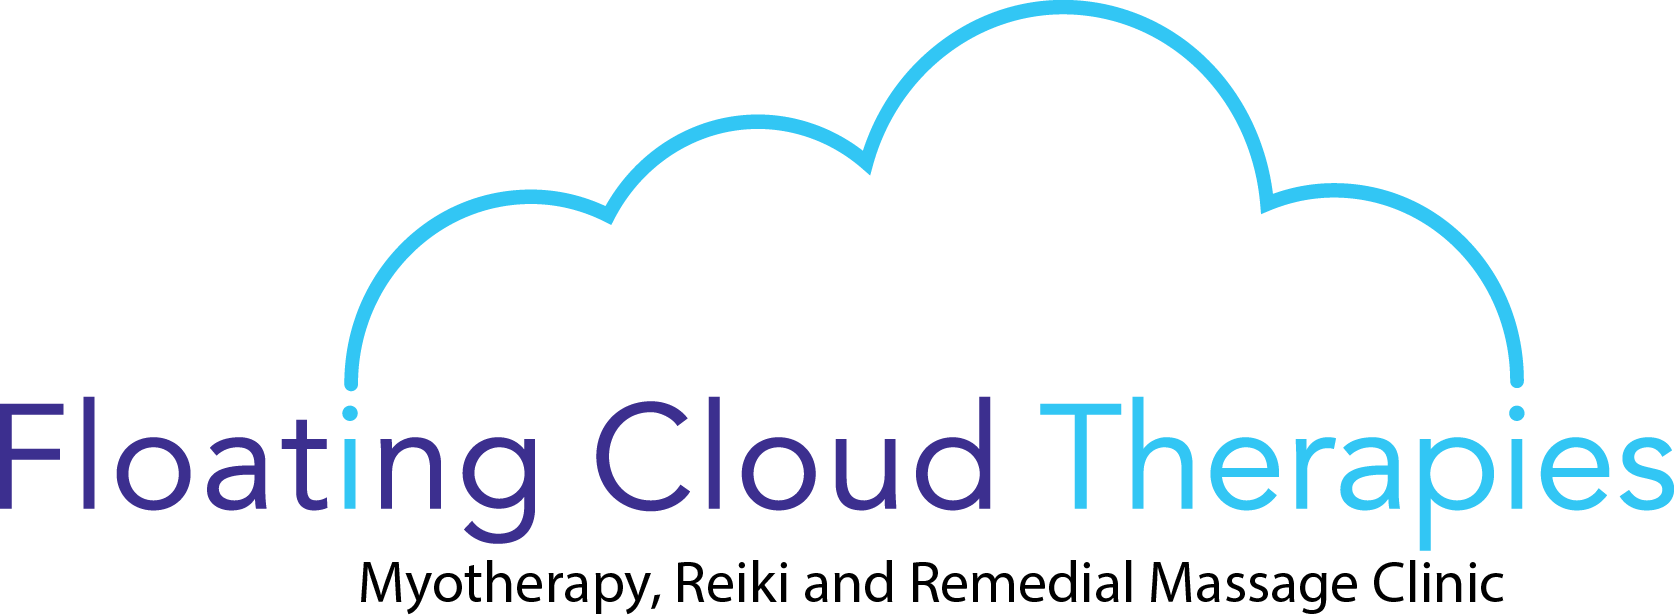 Floating Cloud Therapies Wedding Massage